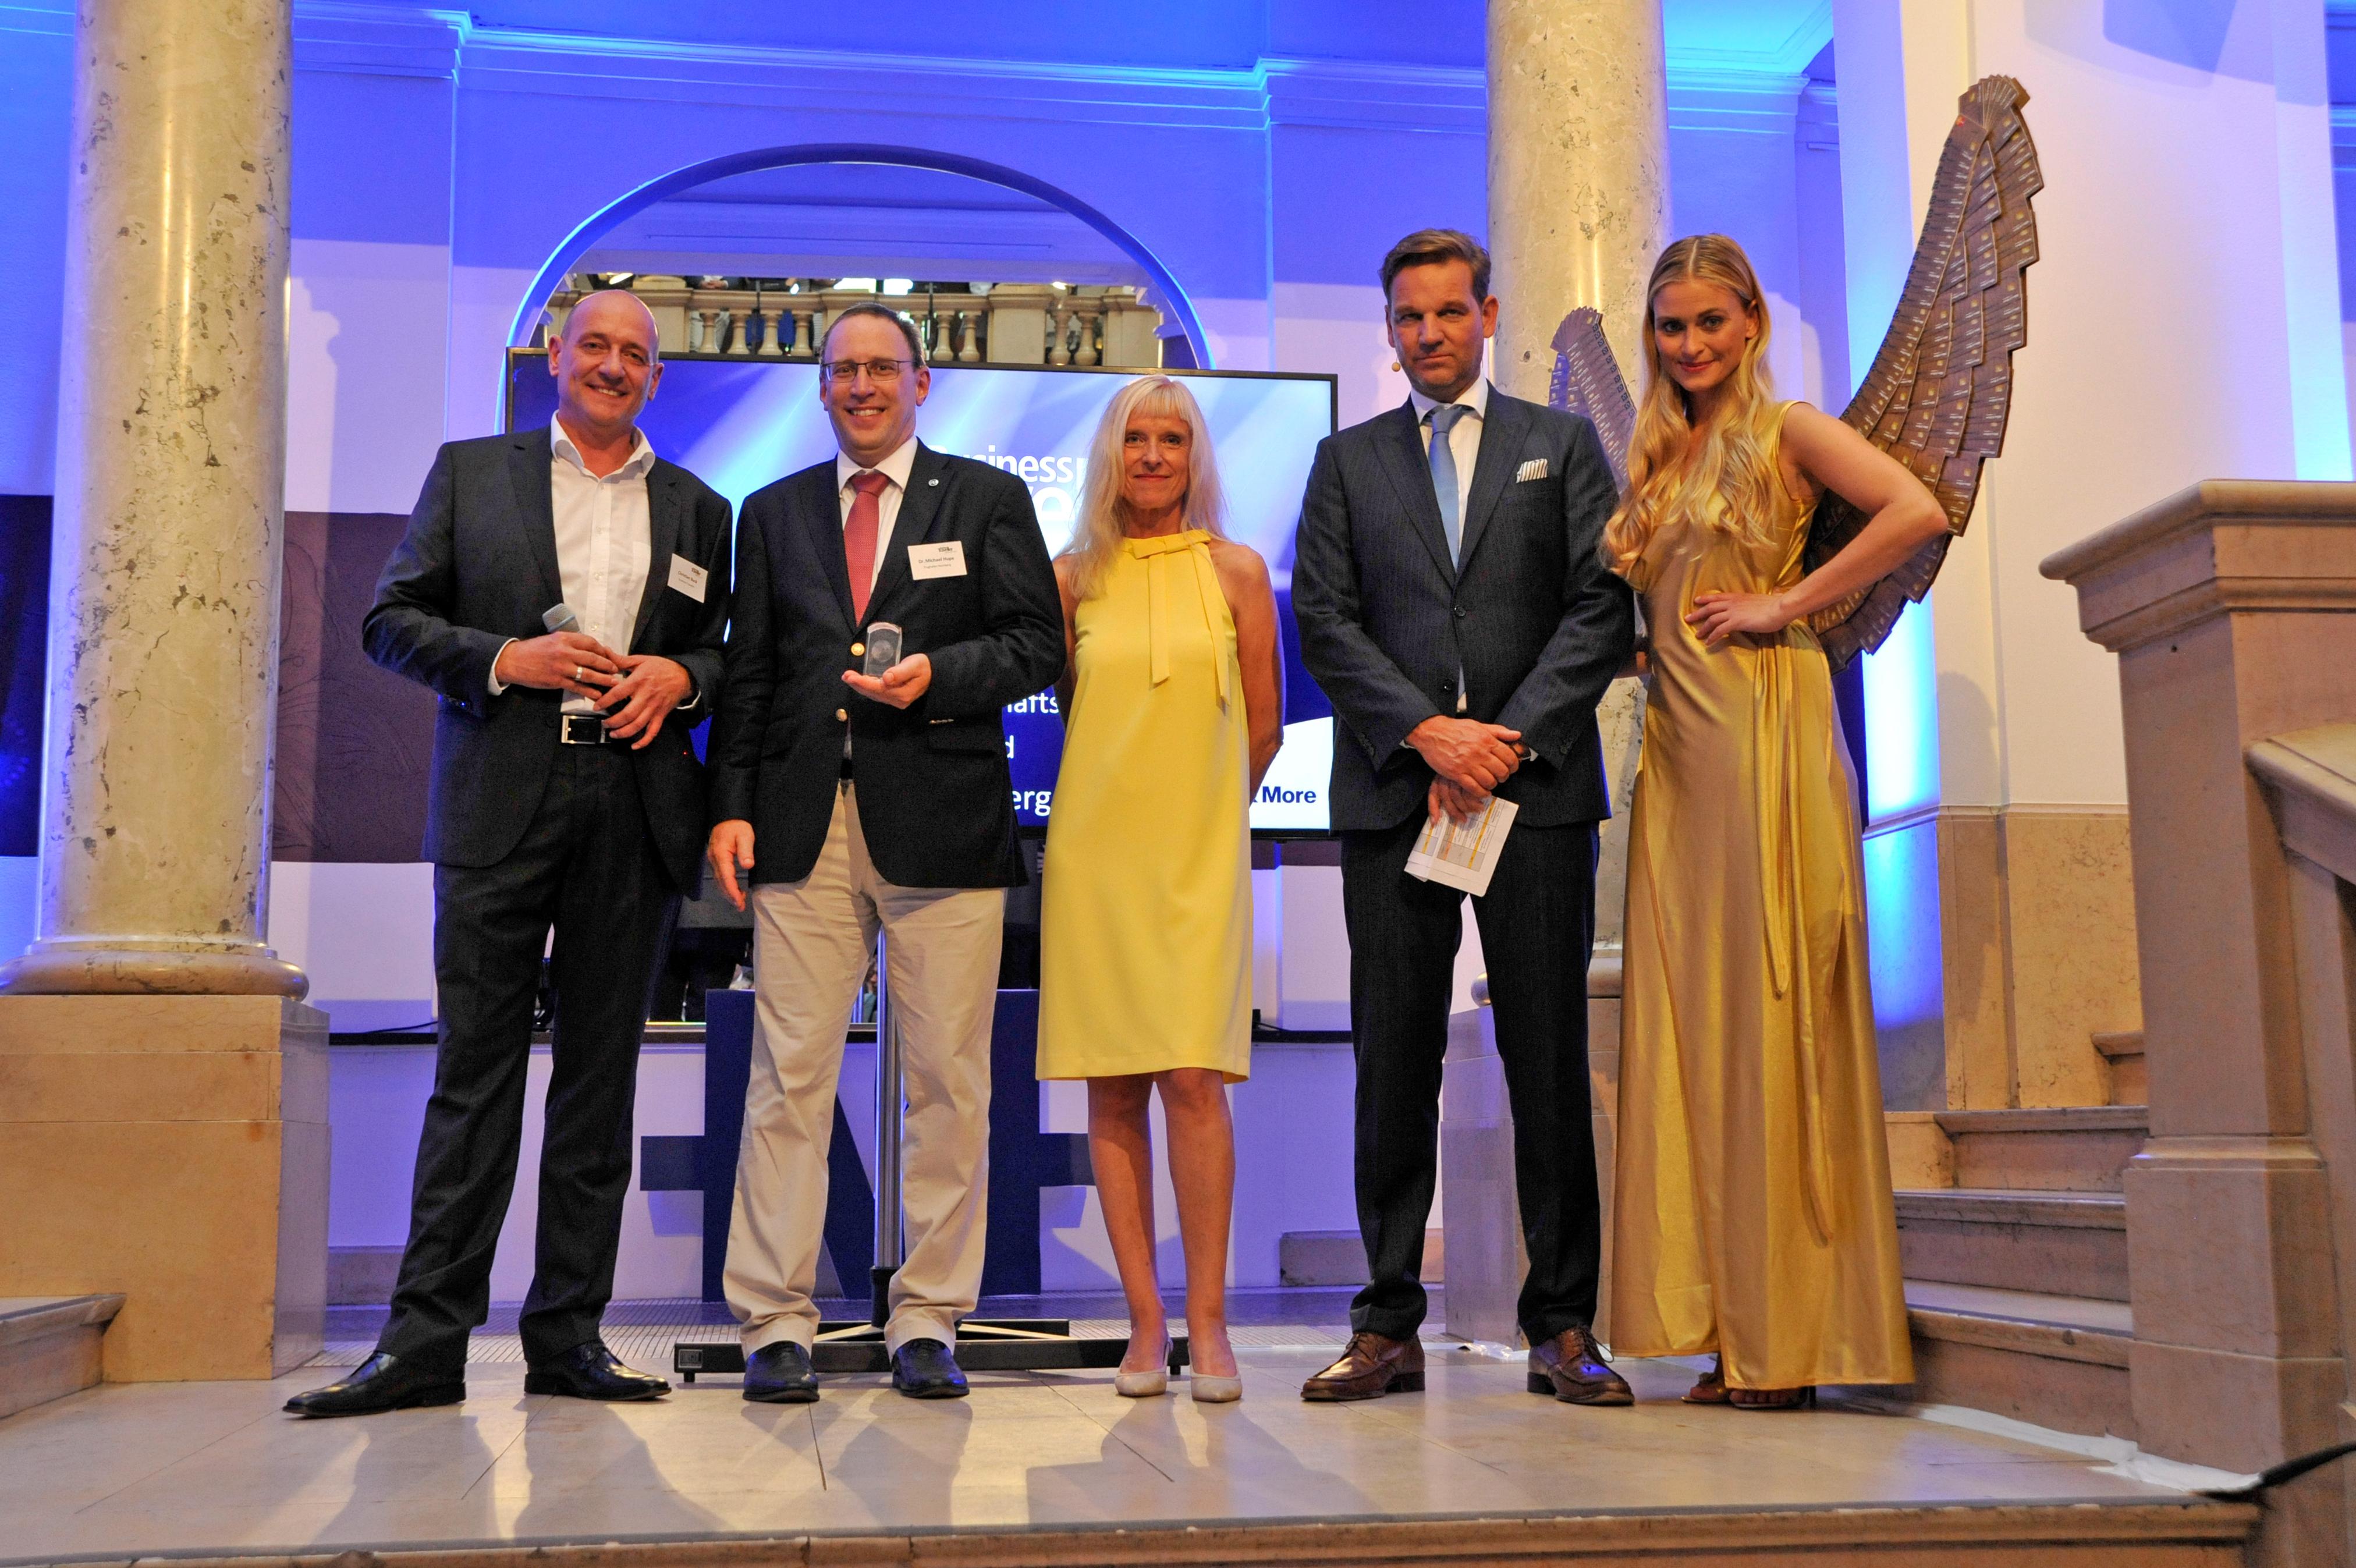 Airport Nürnberg gewinnt zum 10. Mal in Folge den Business Traveller Award als bester deutscher Flughafen